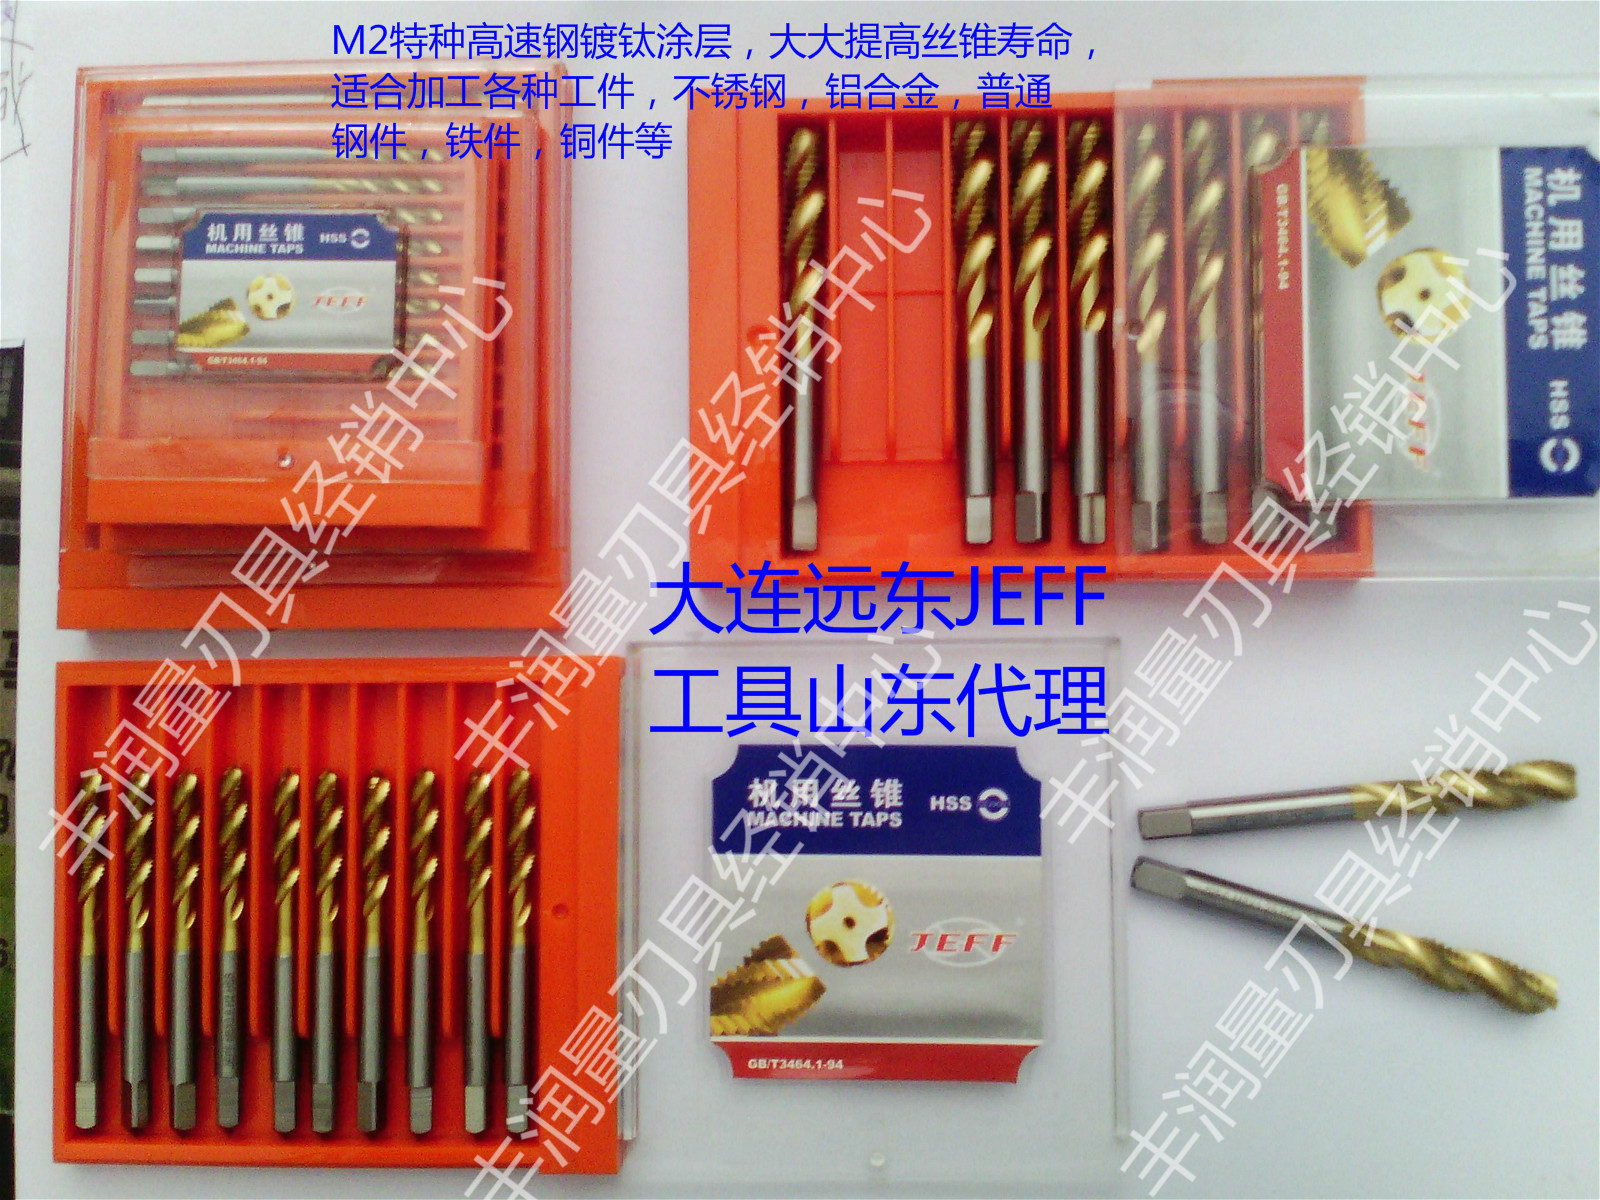 Dalian Far East spiral groove titanium coating tap tapping M12*1.75, M14*2, M16*2, M12*1.5